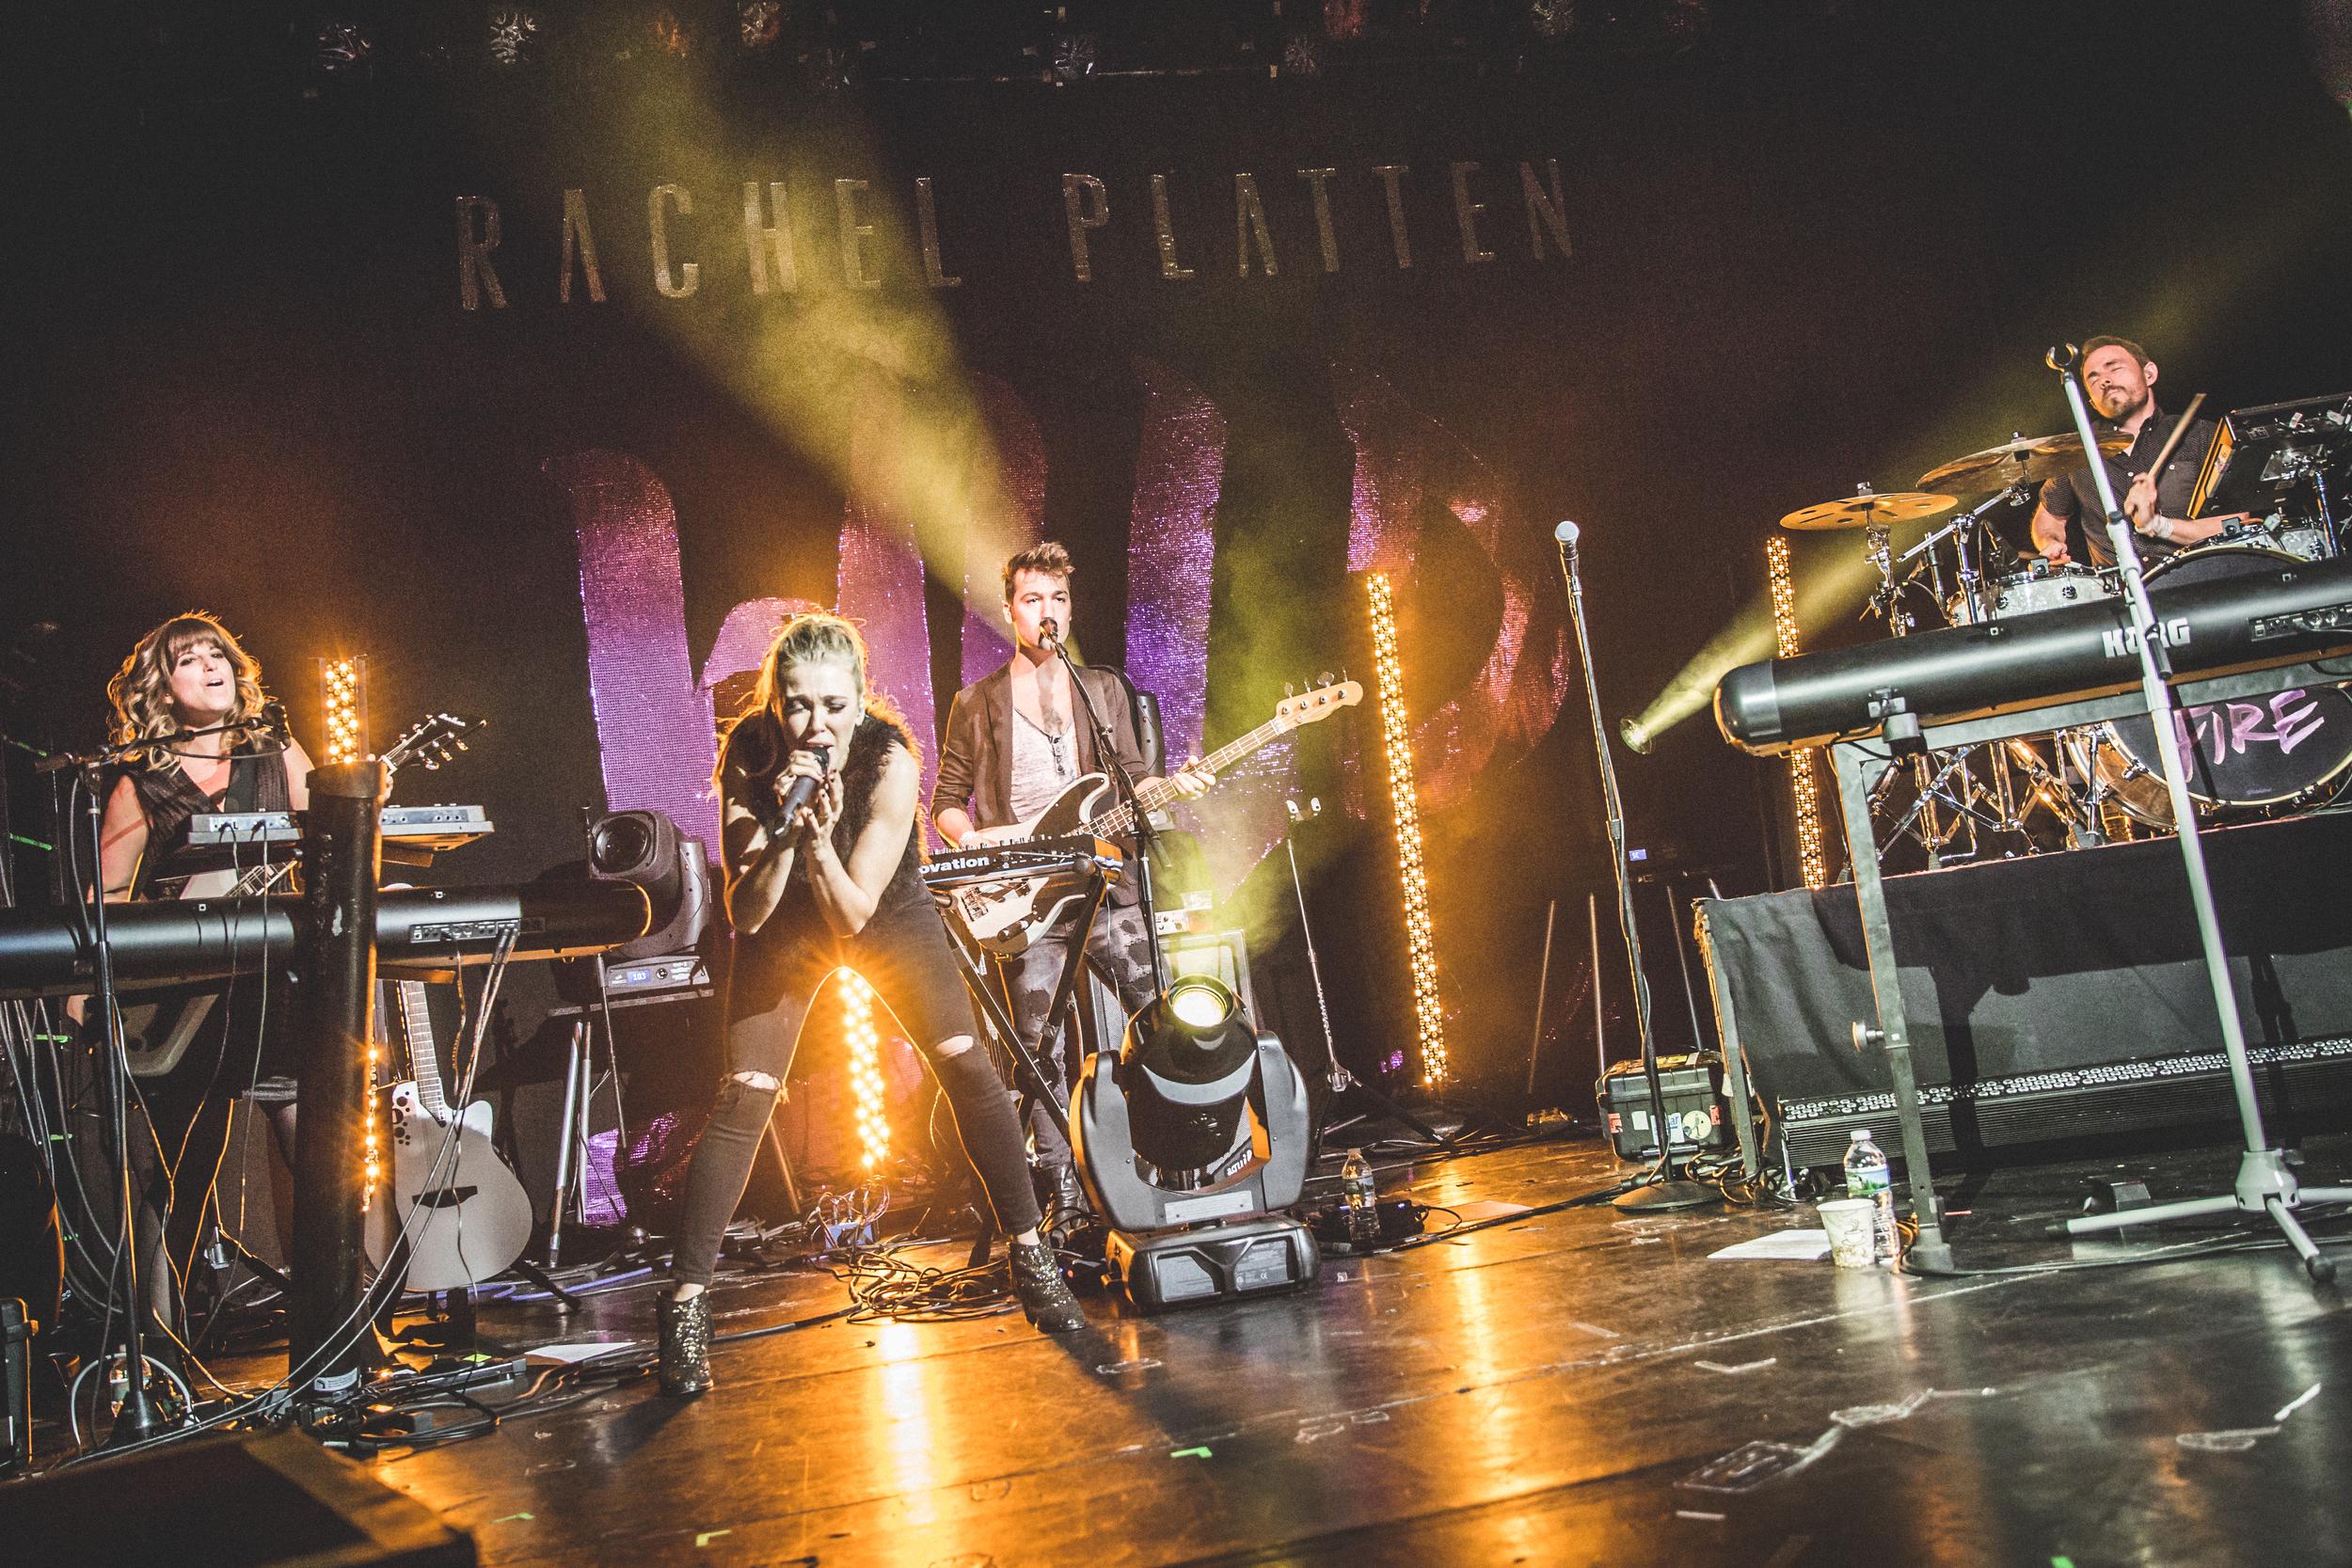 2016.03.10 Rachel Platten at Irving Plaza-3.jpg